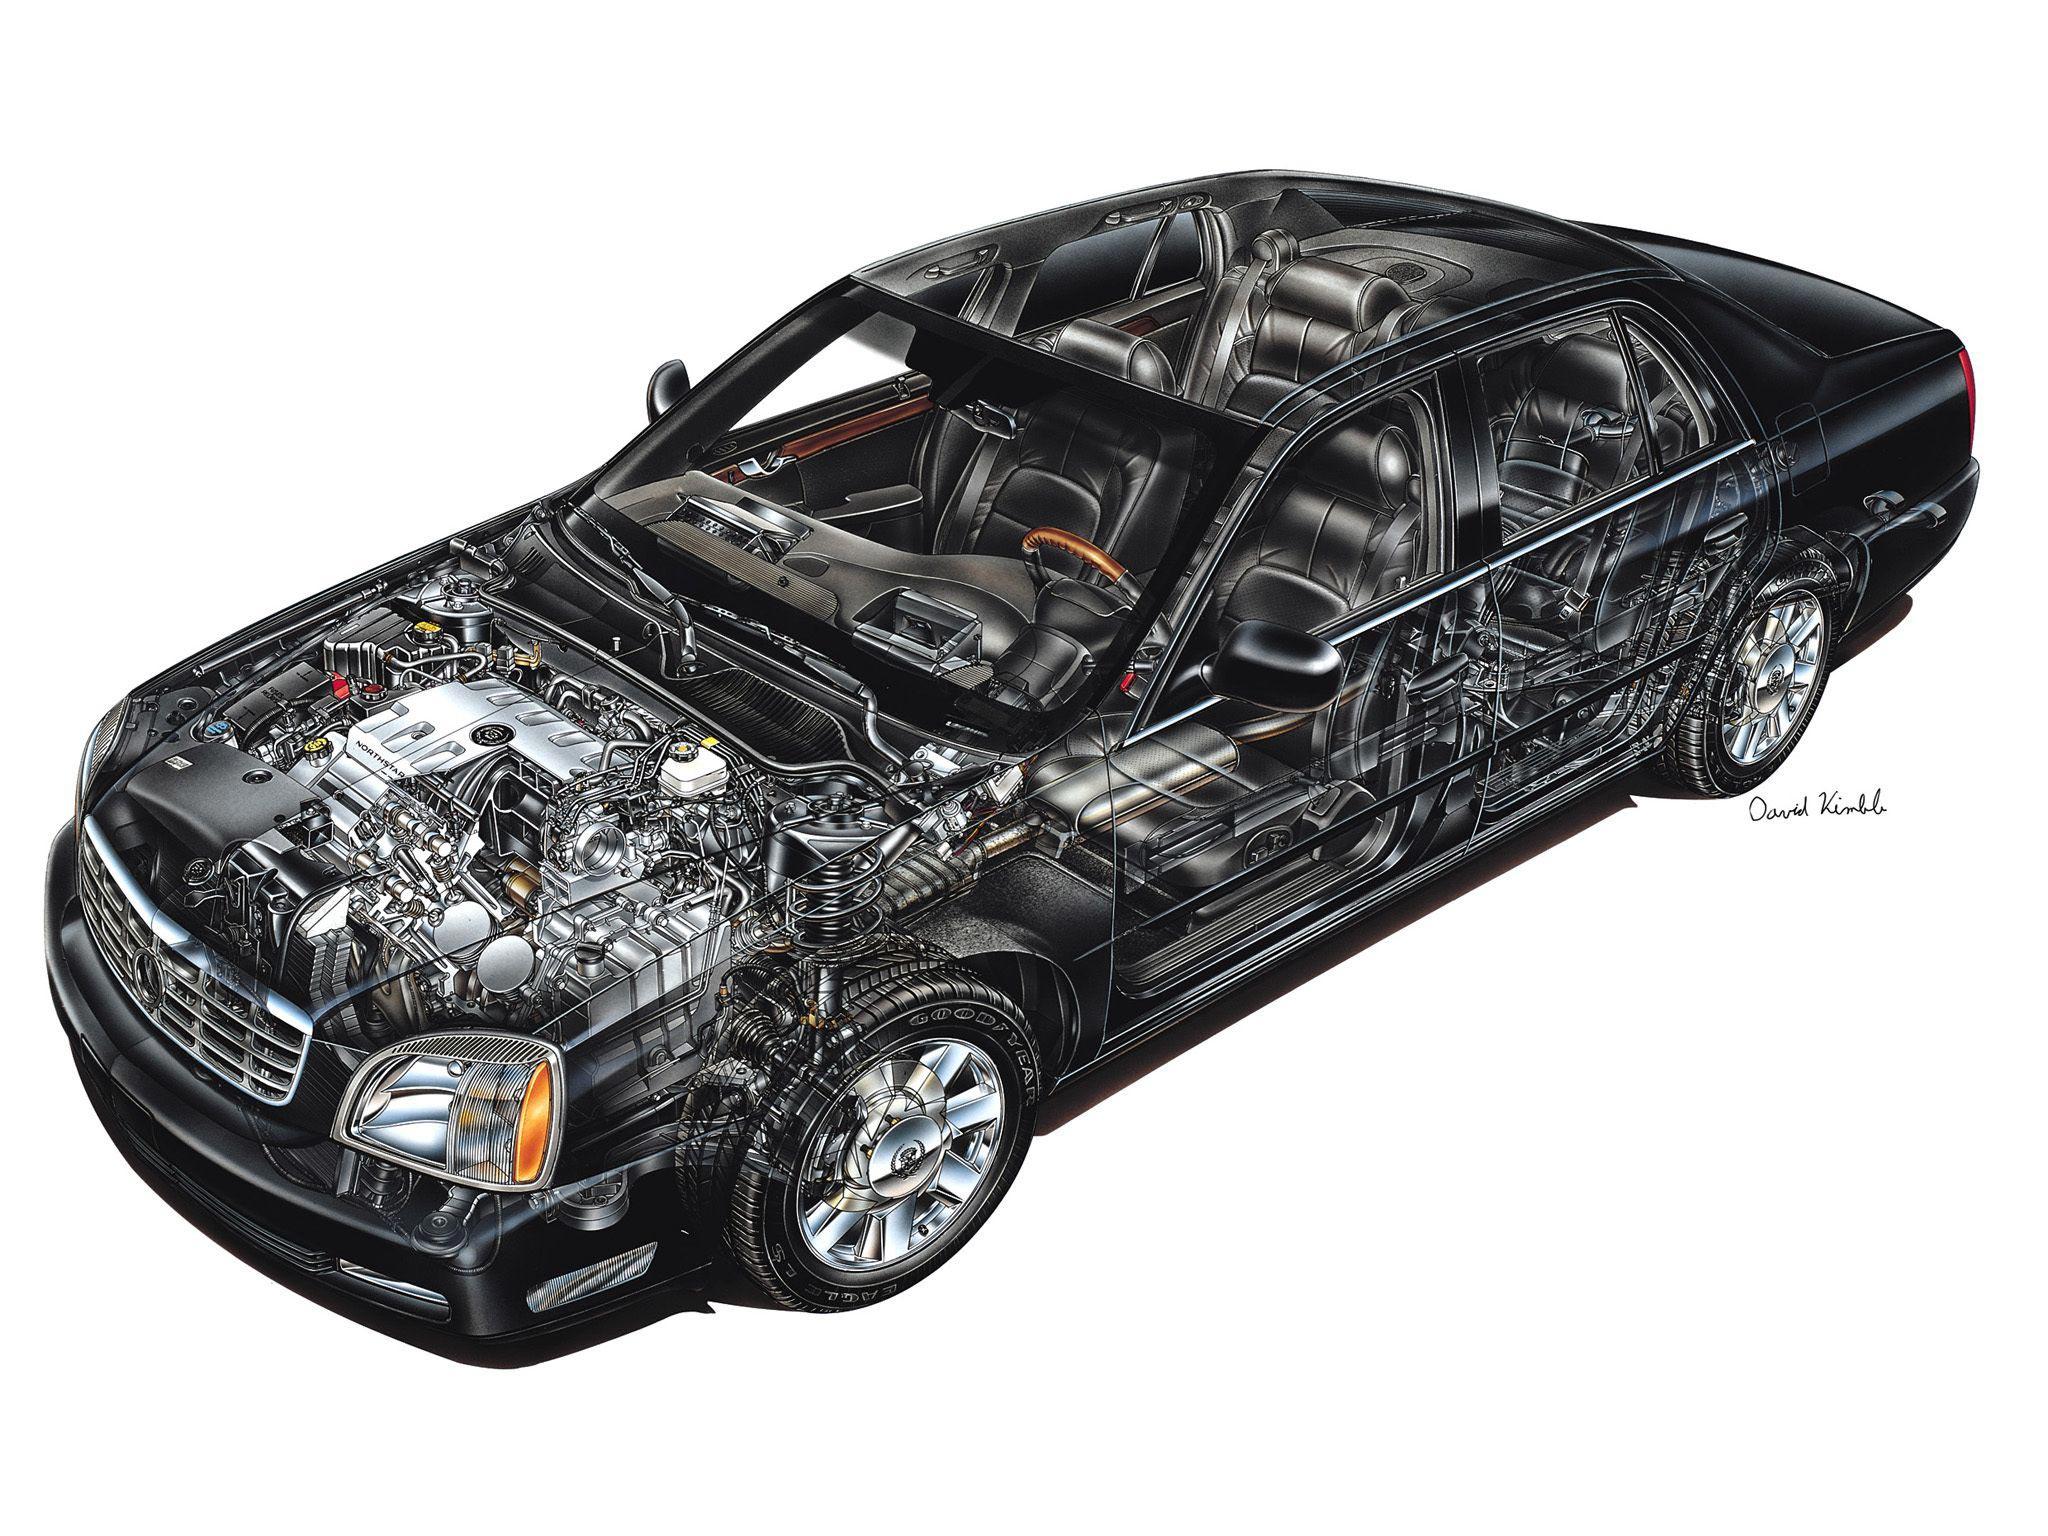 Cadillac Deville cutaway drawing